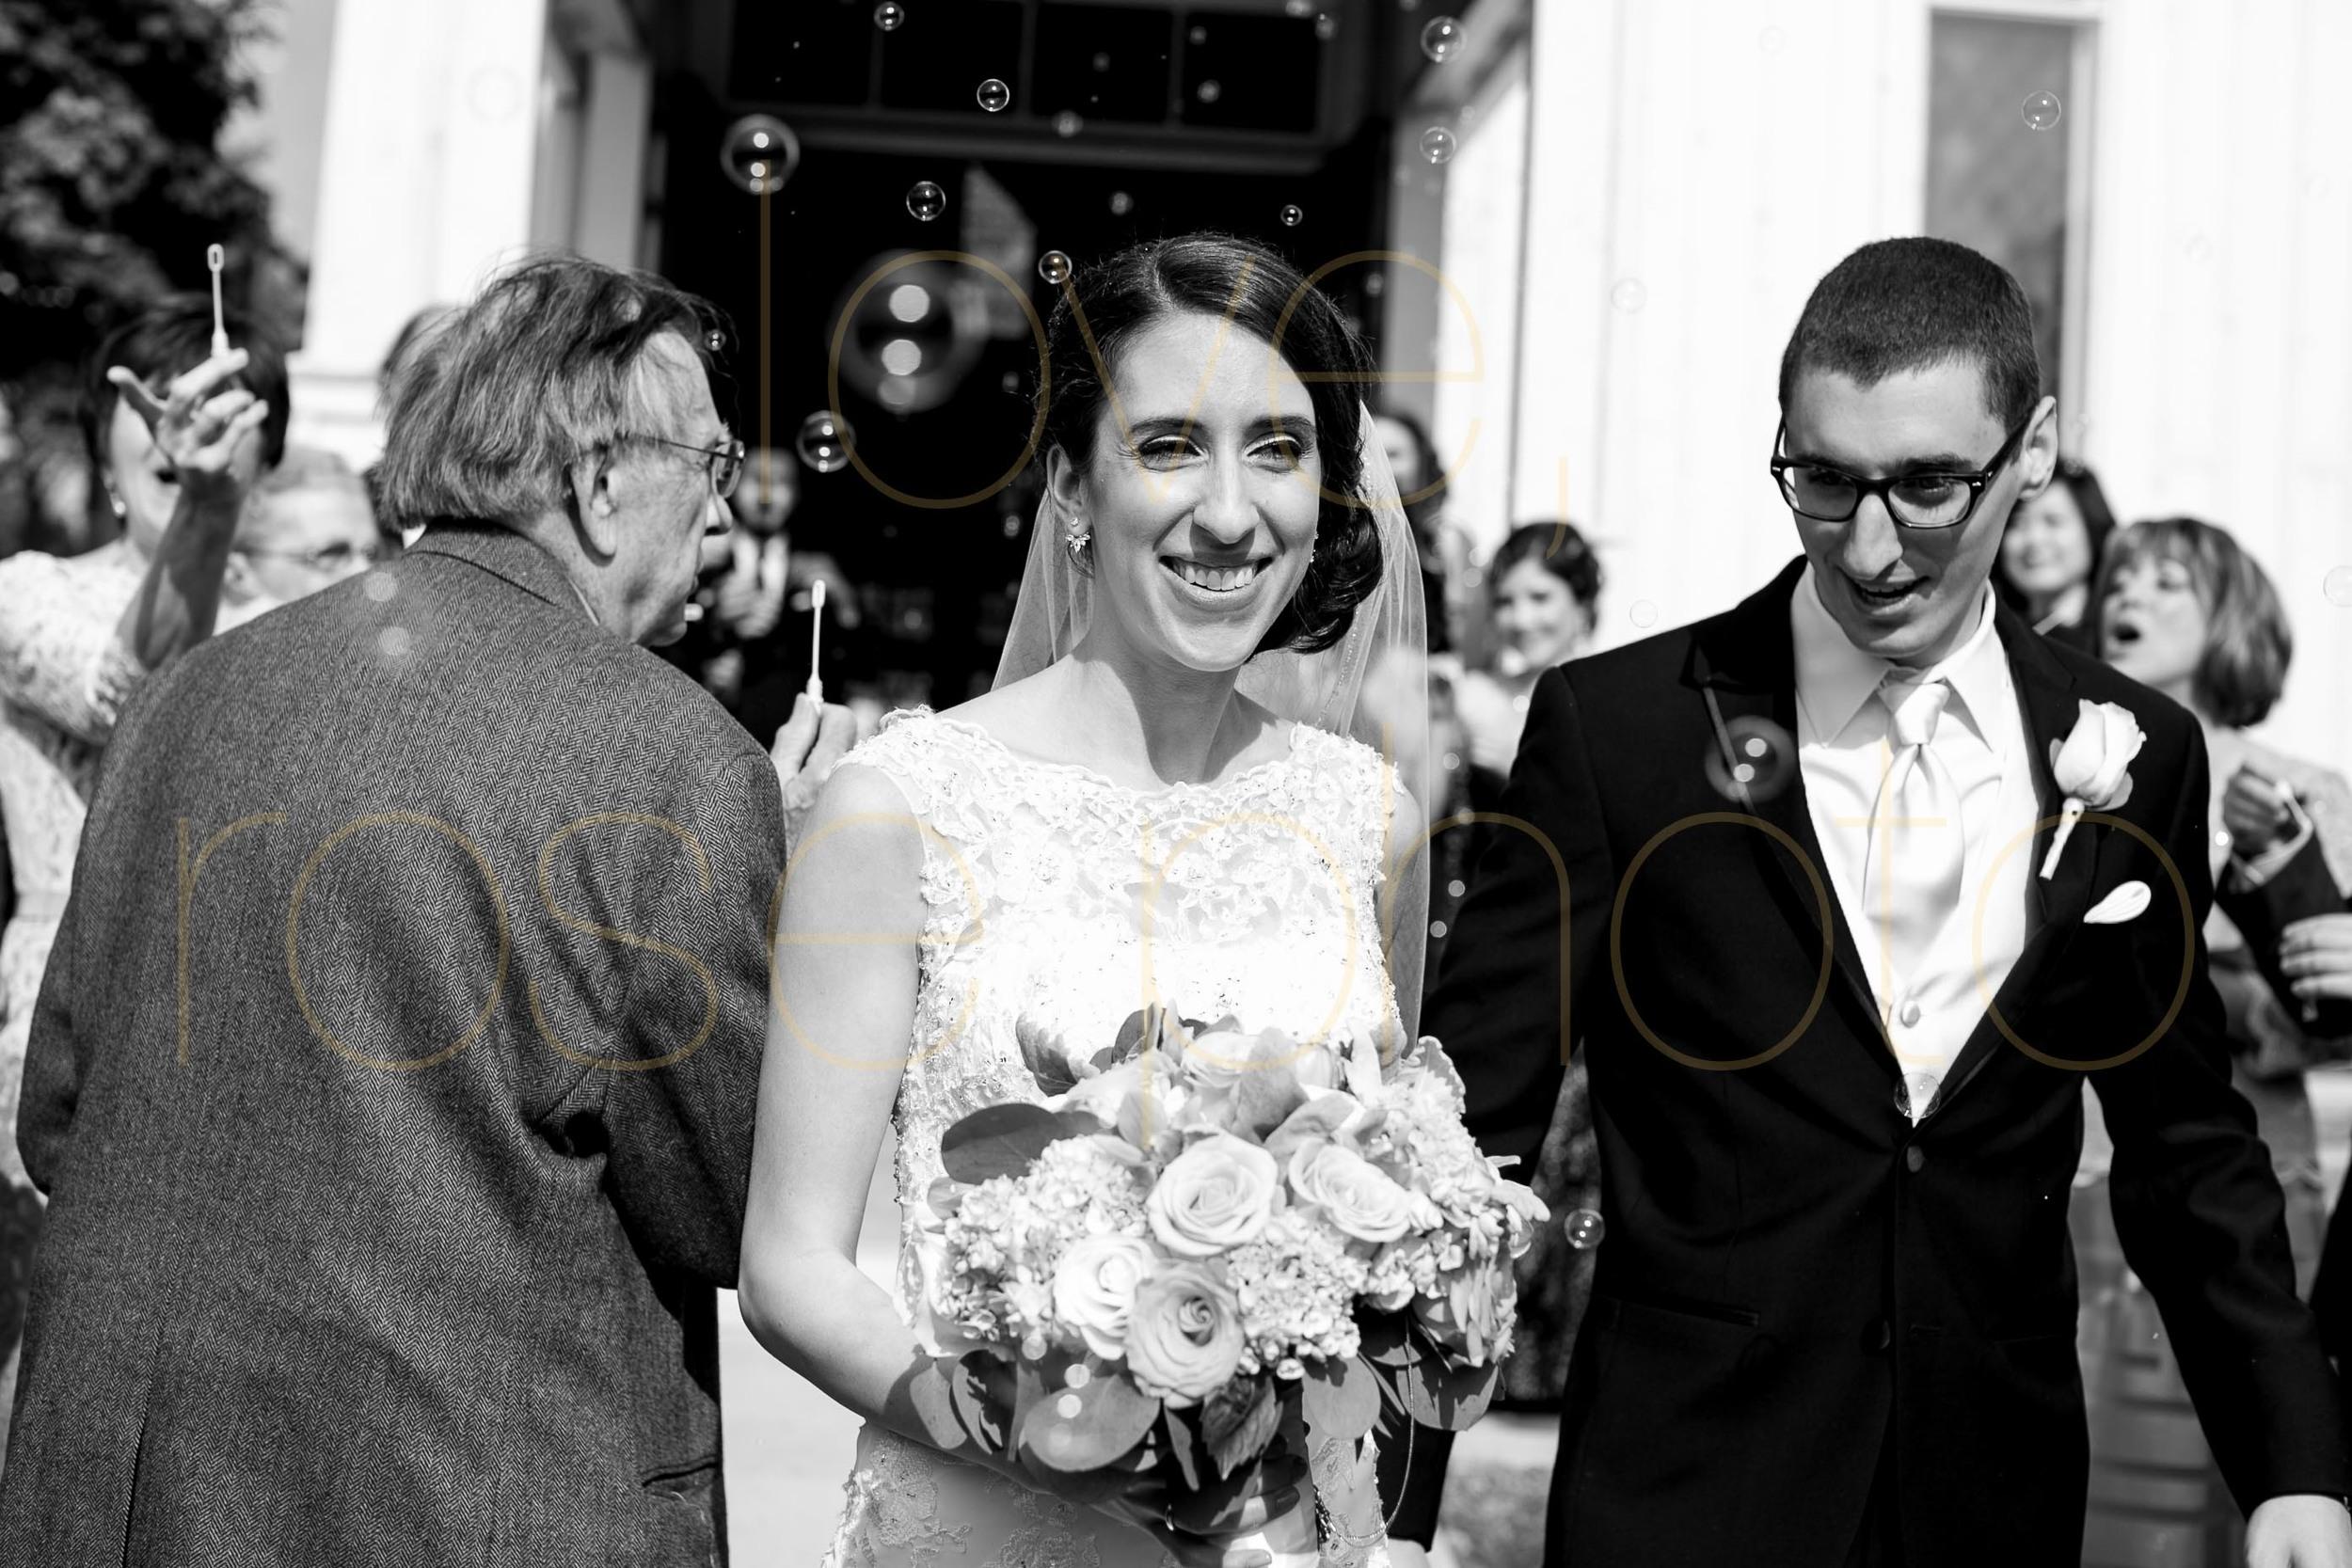 K Bianci maple chaple summer wedding chicago photographer -0253.jpg